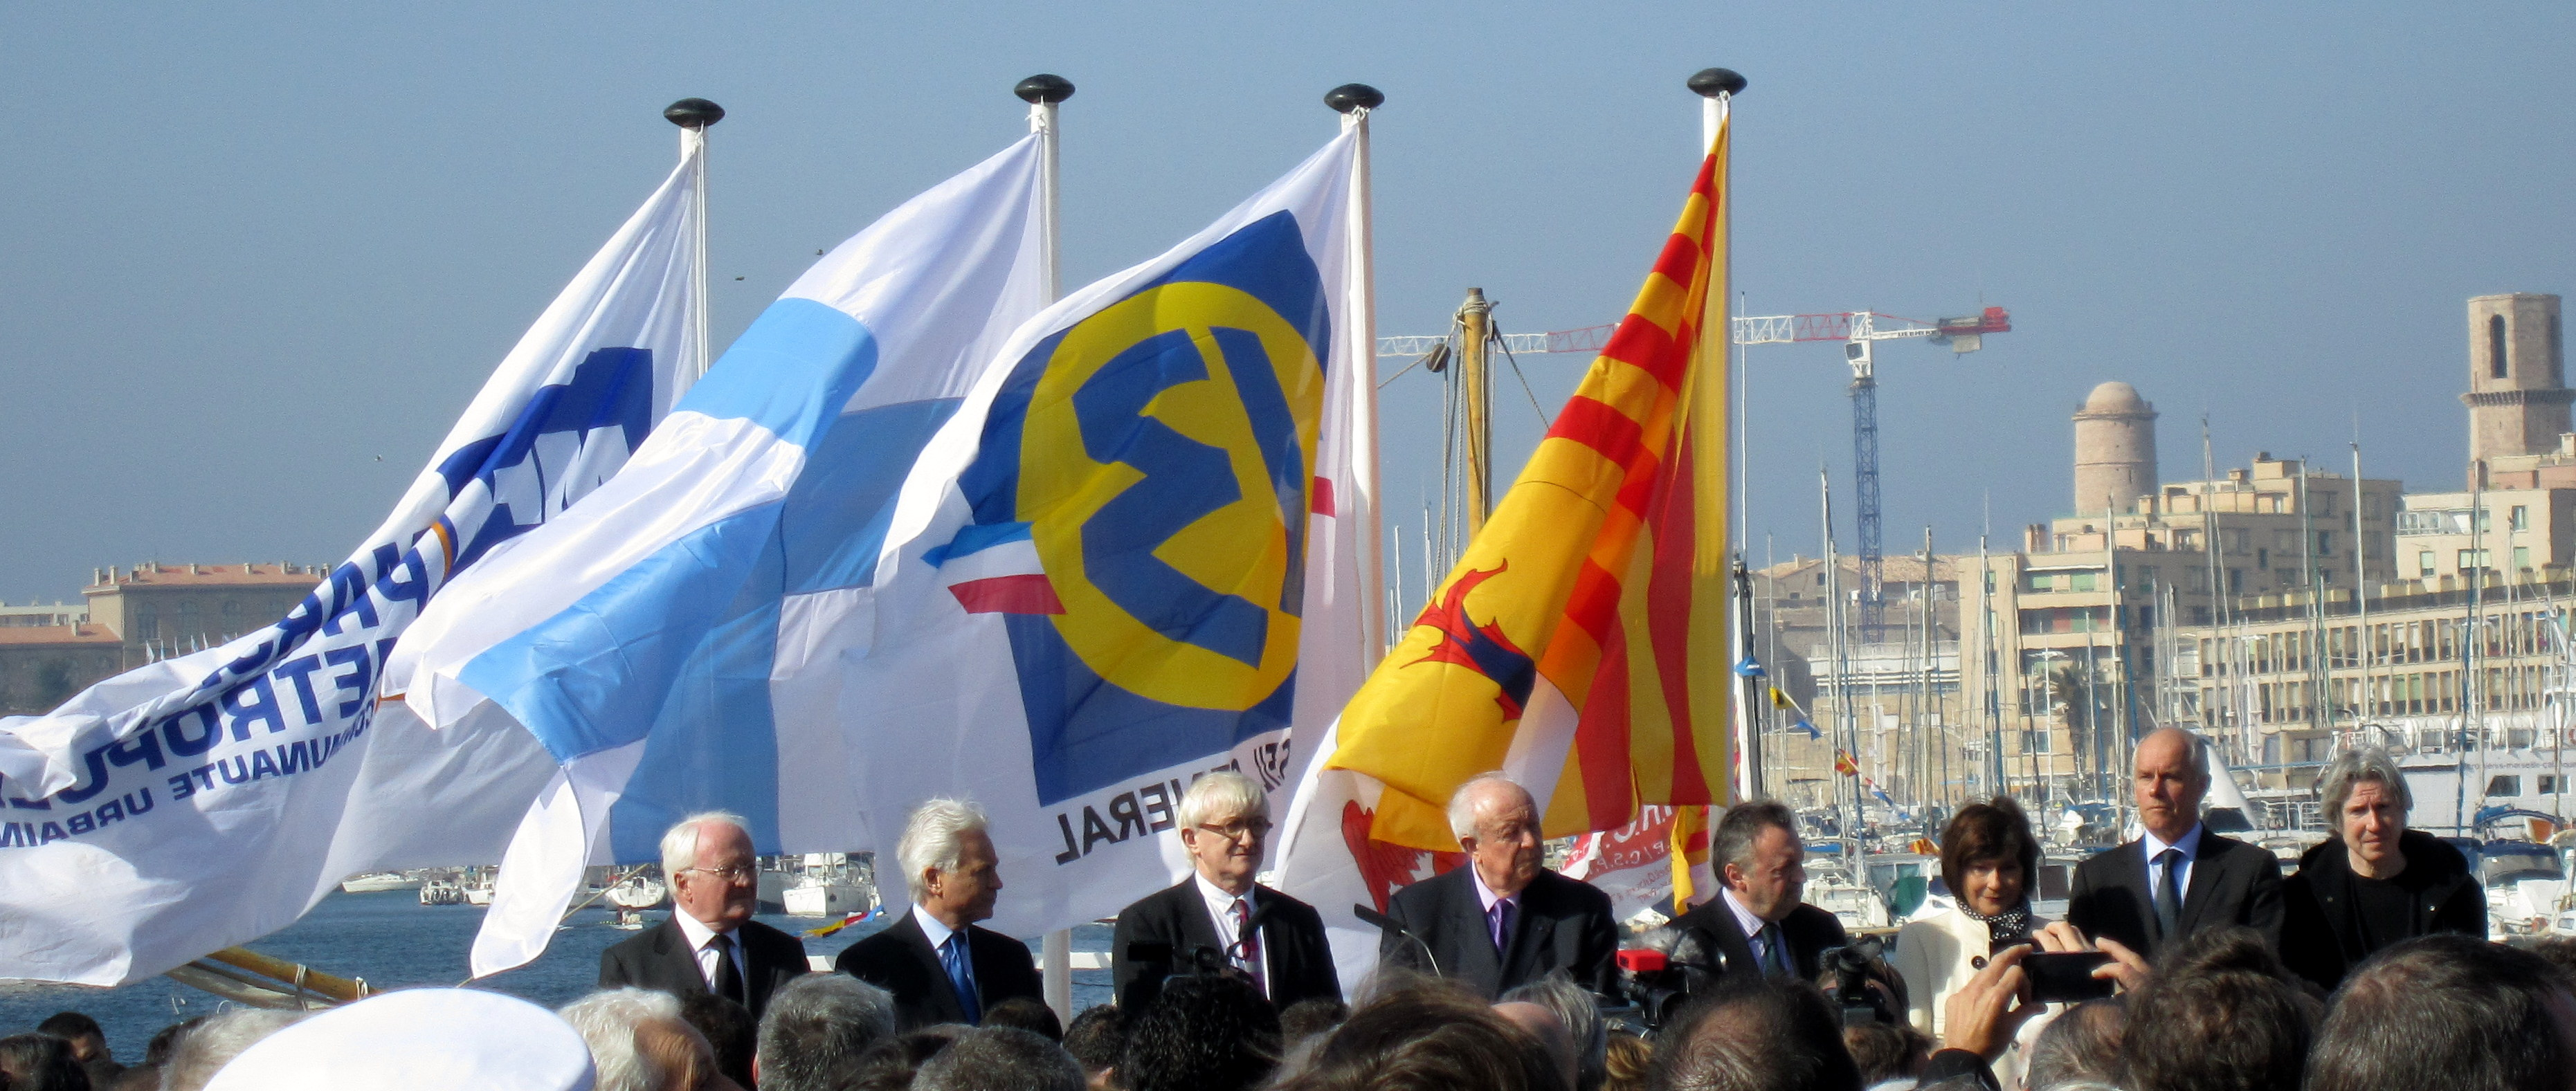 inauguration-vieux-port